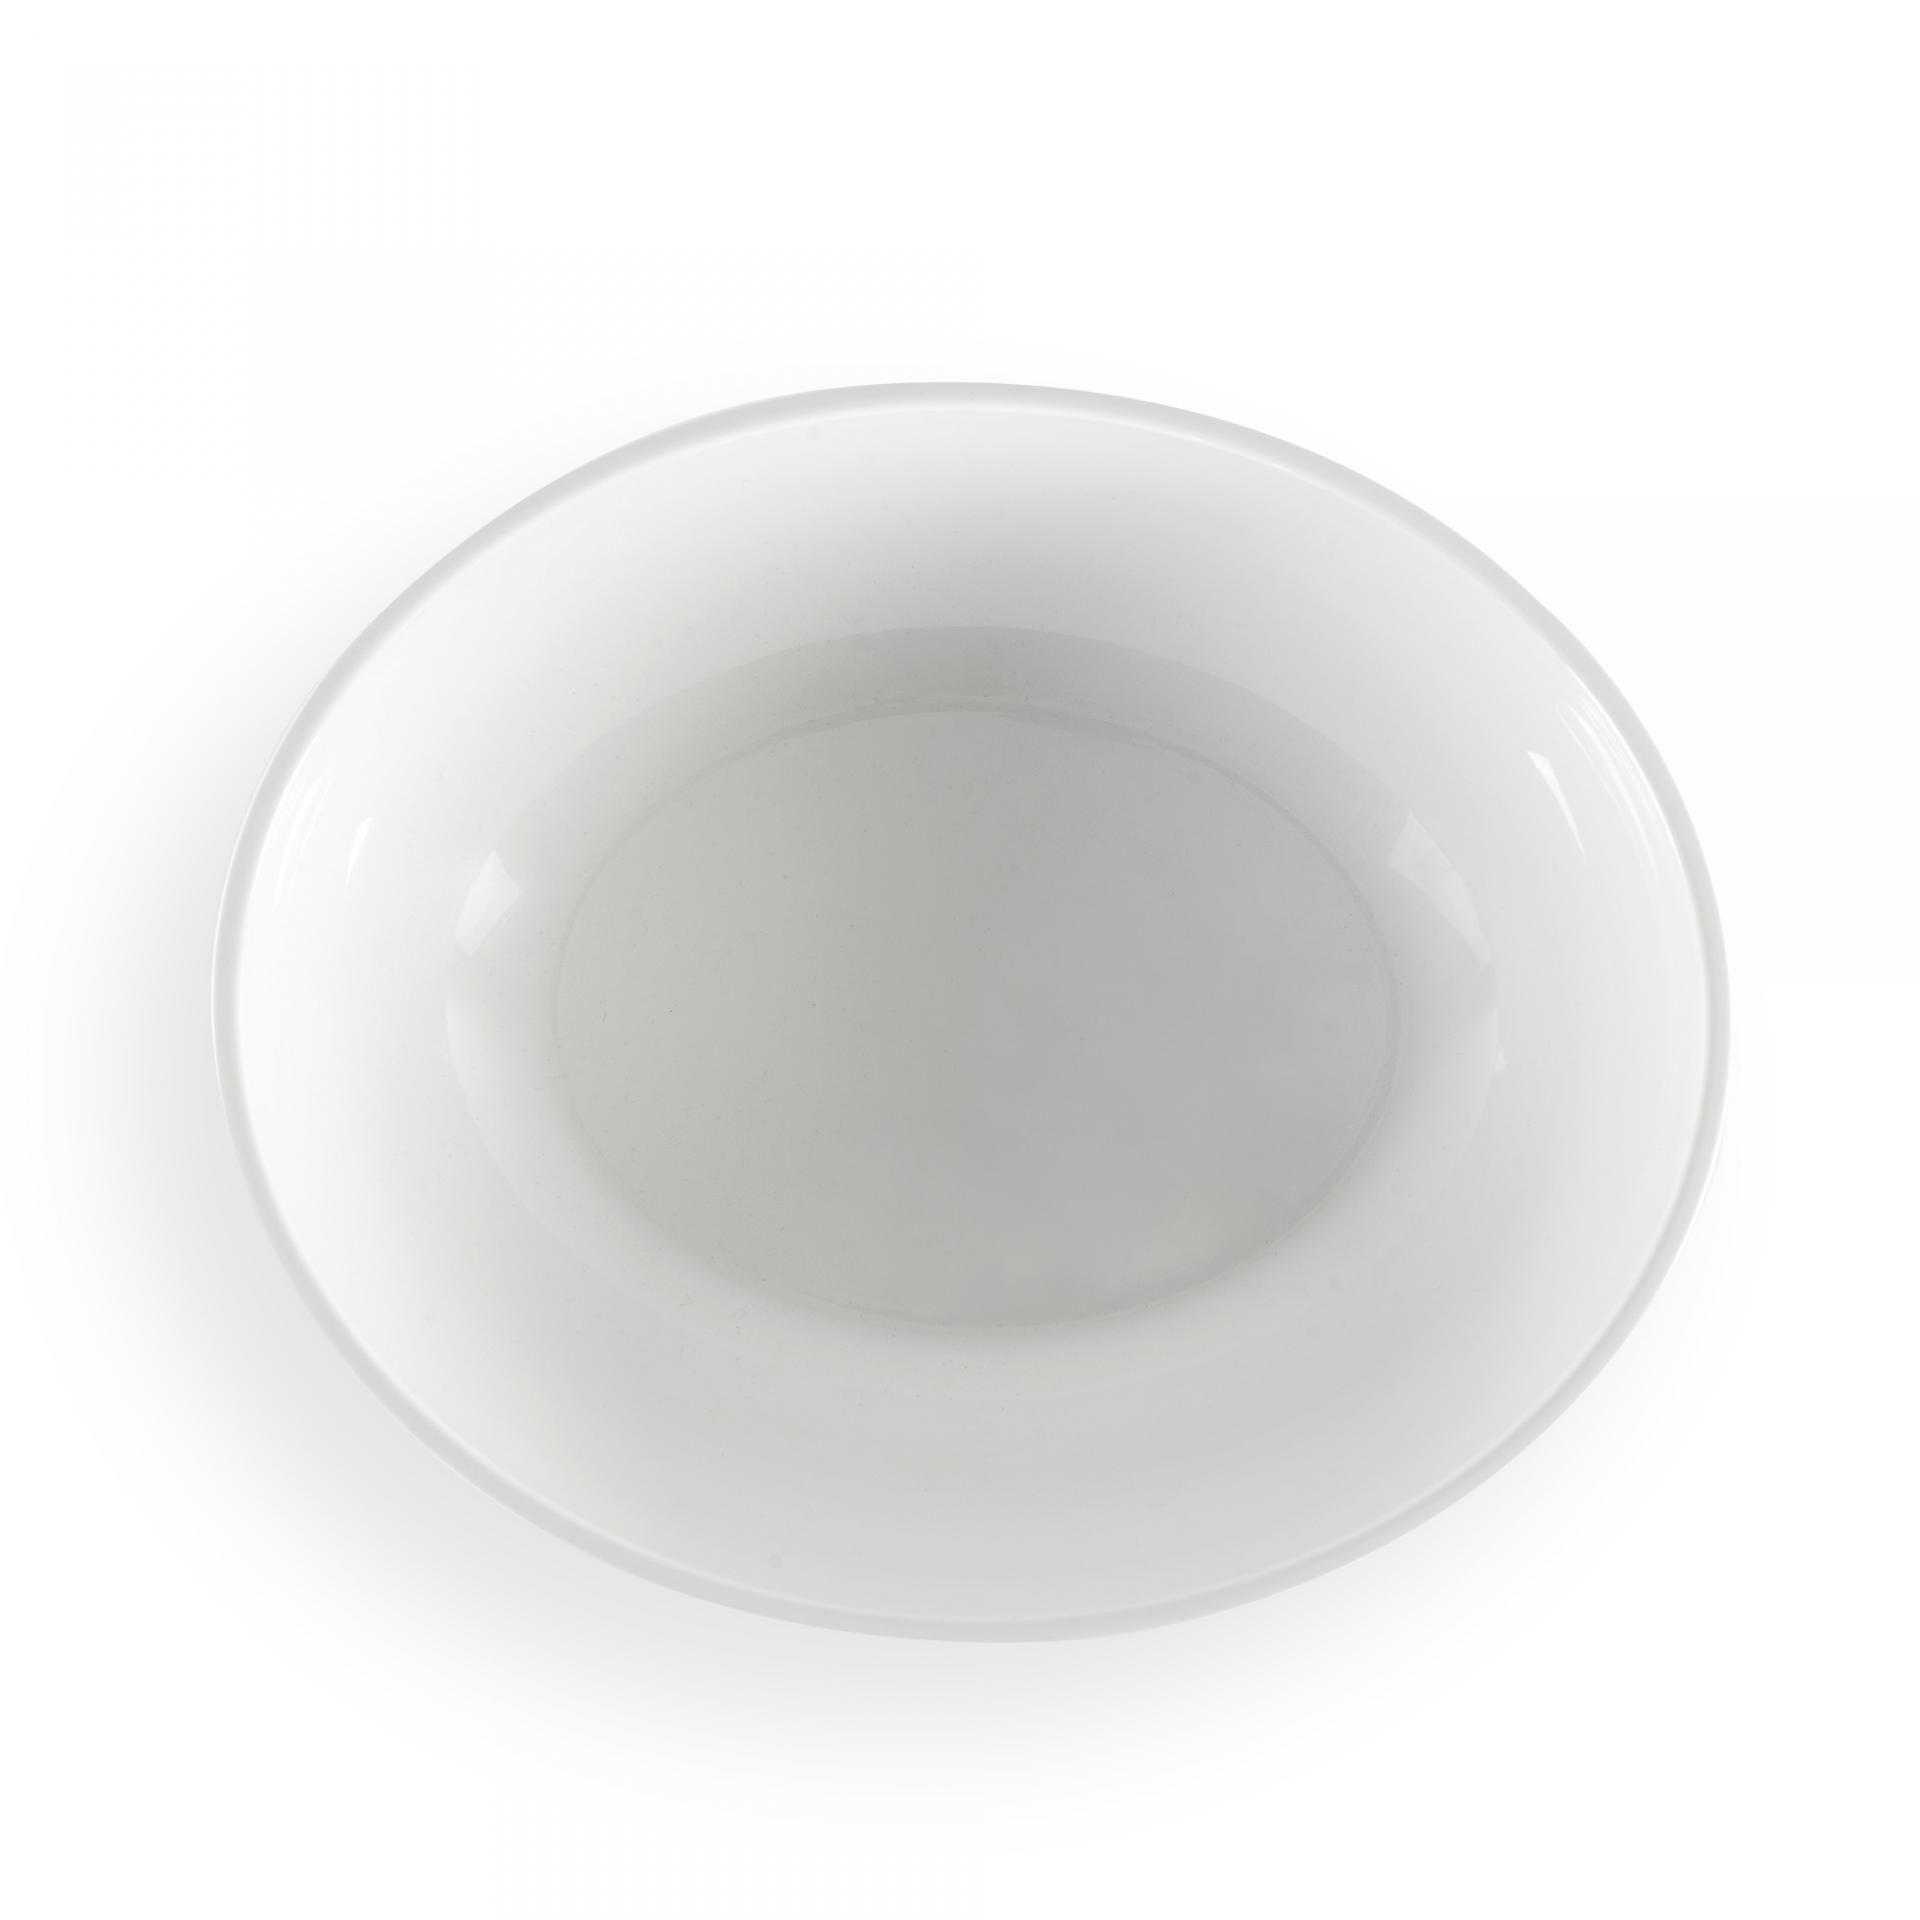 Saladeira Oval Haus Concept Metro 2,9L Branca 53801/001